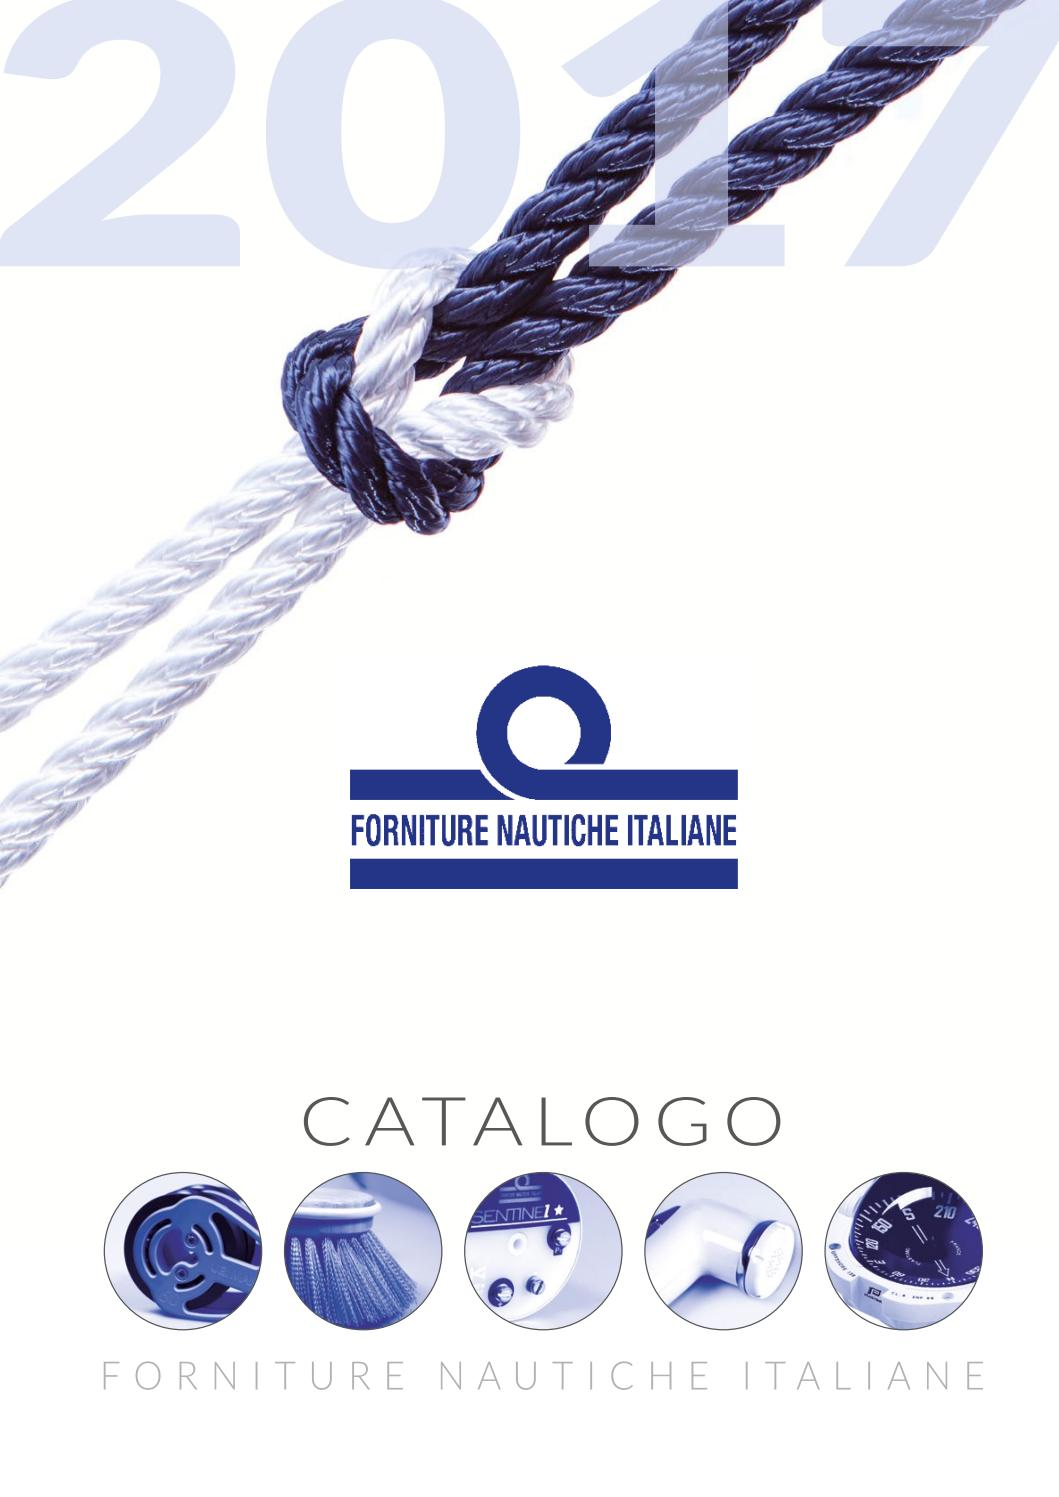 Catalogo fni 2017 by F.N.I. issuu